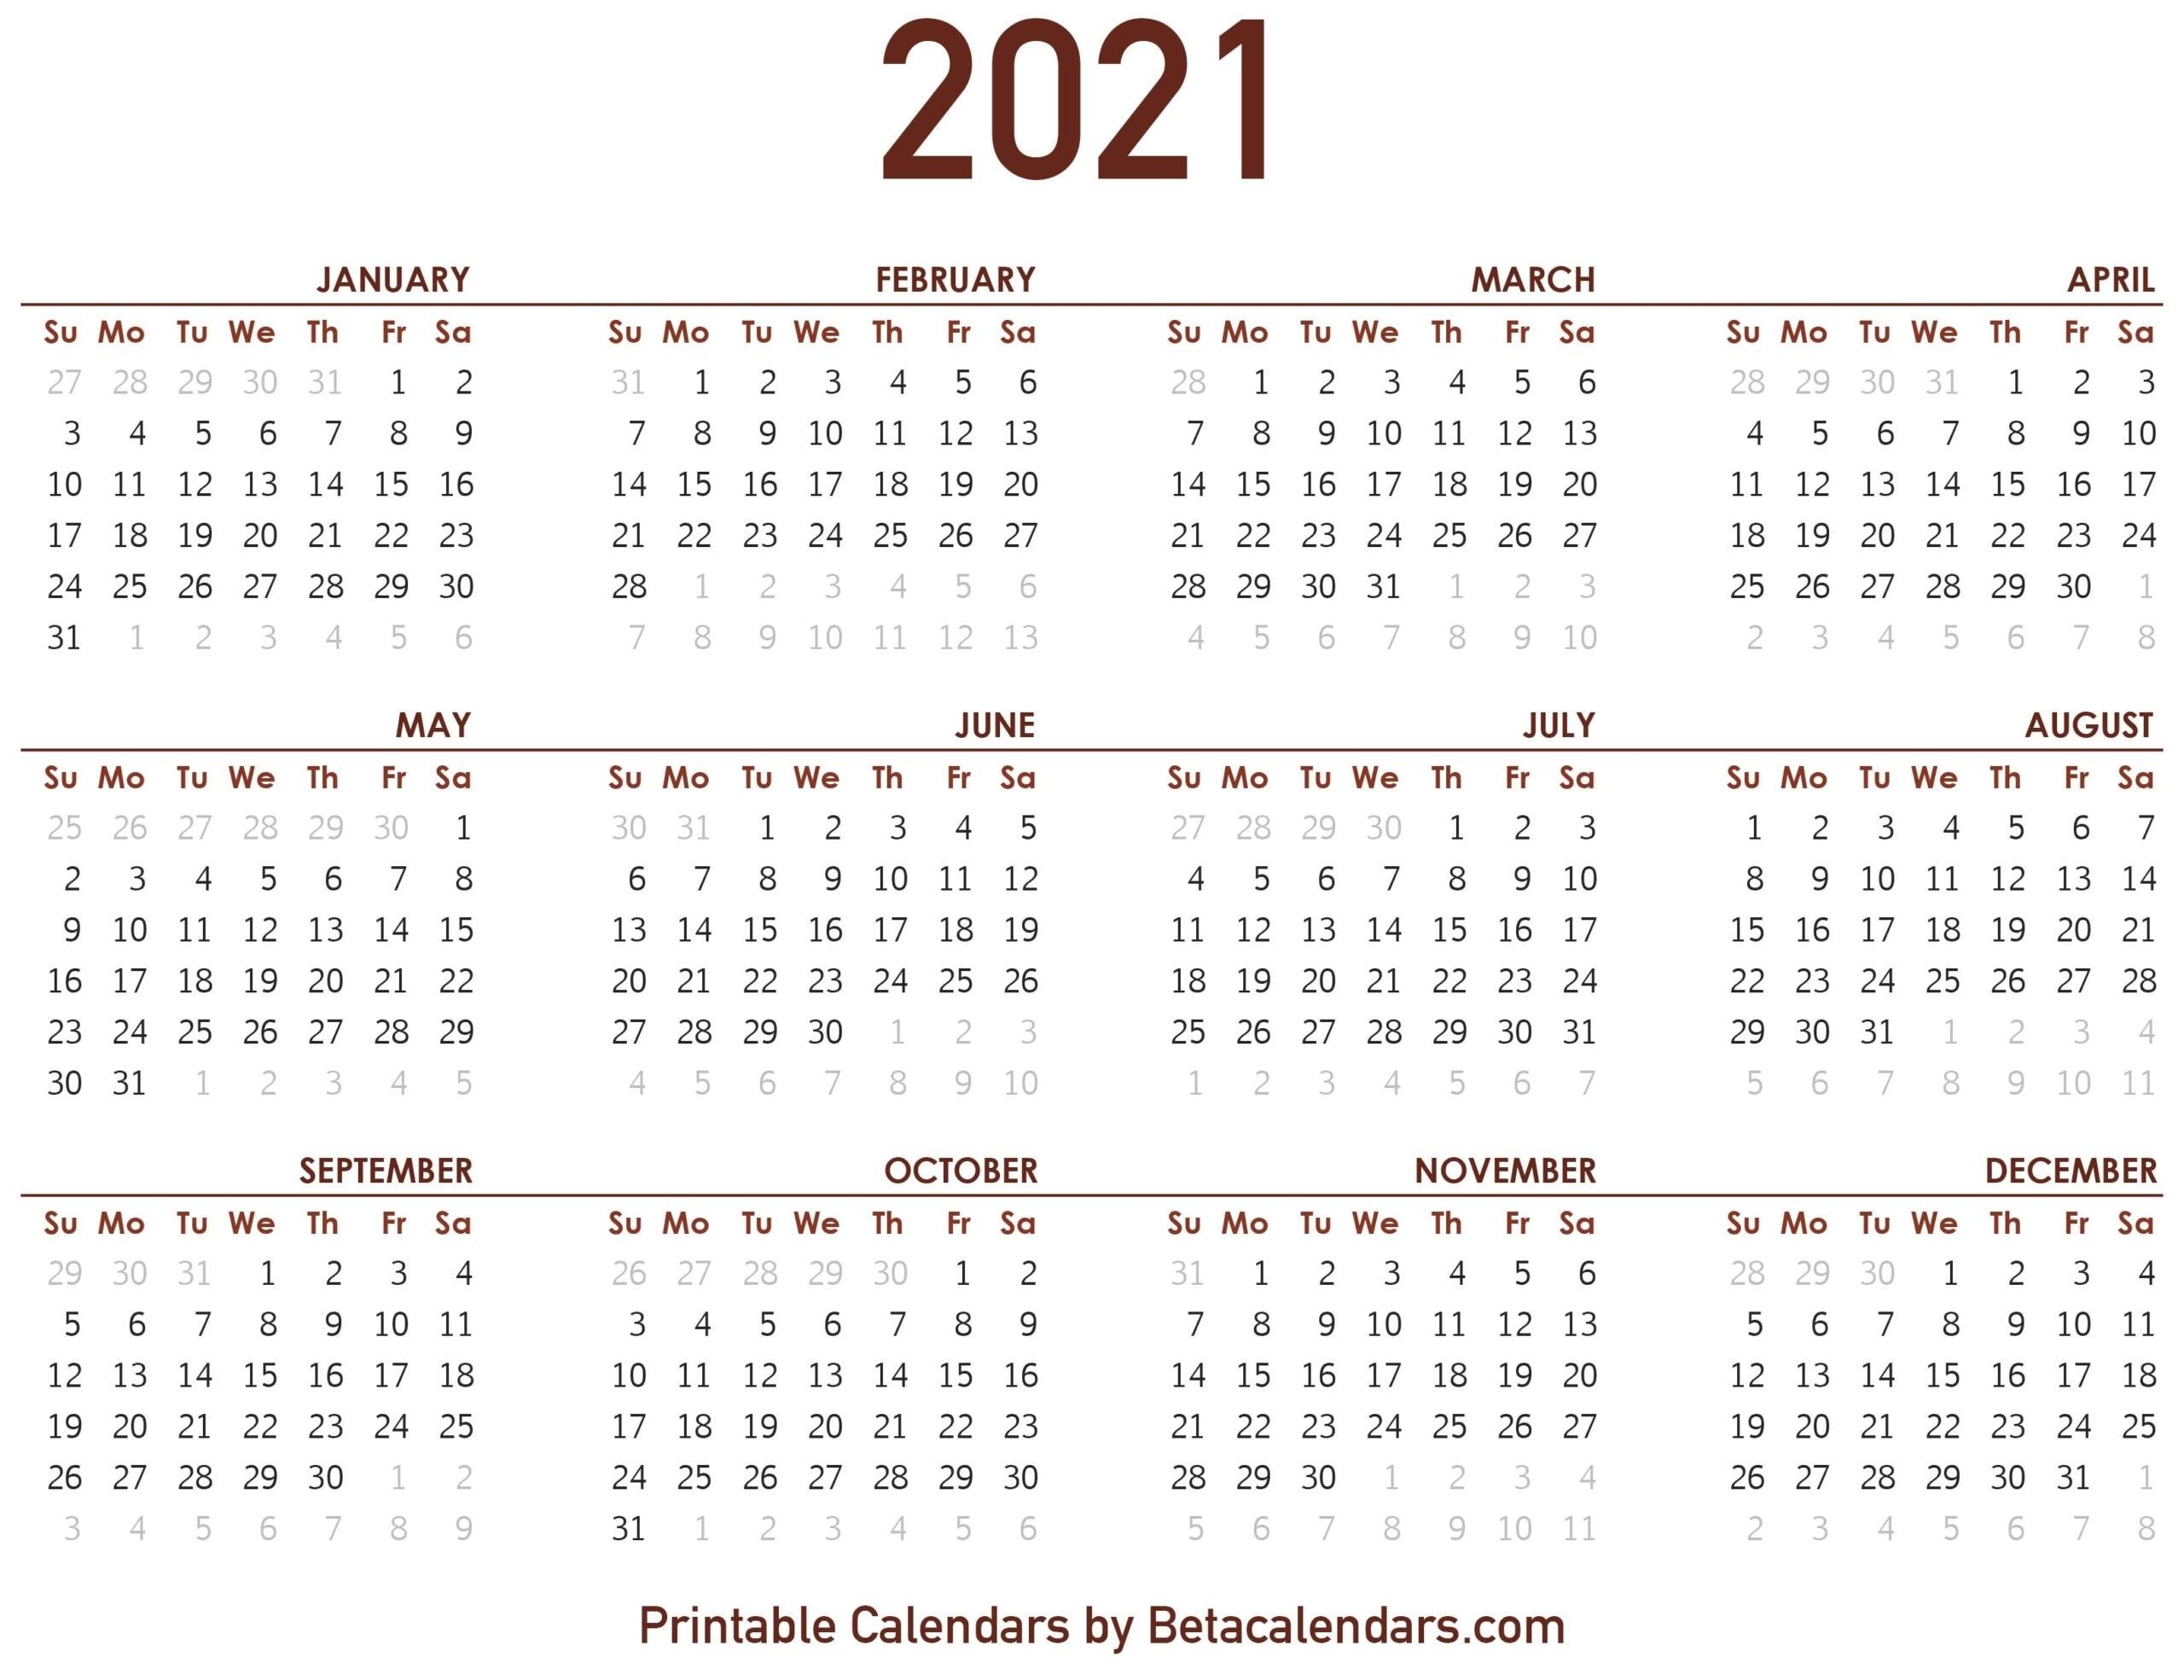 2021 Calendar - Beta Calendars